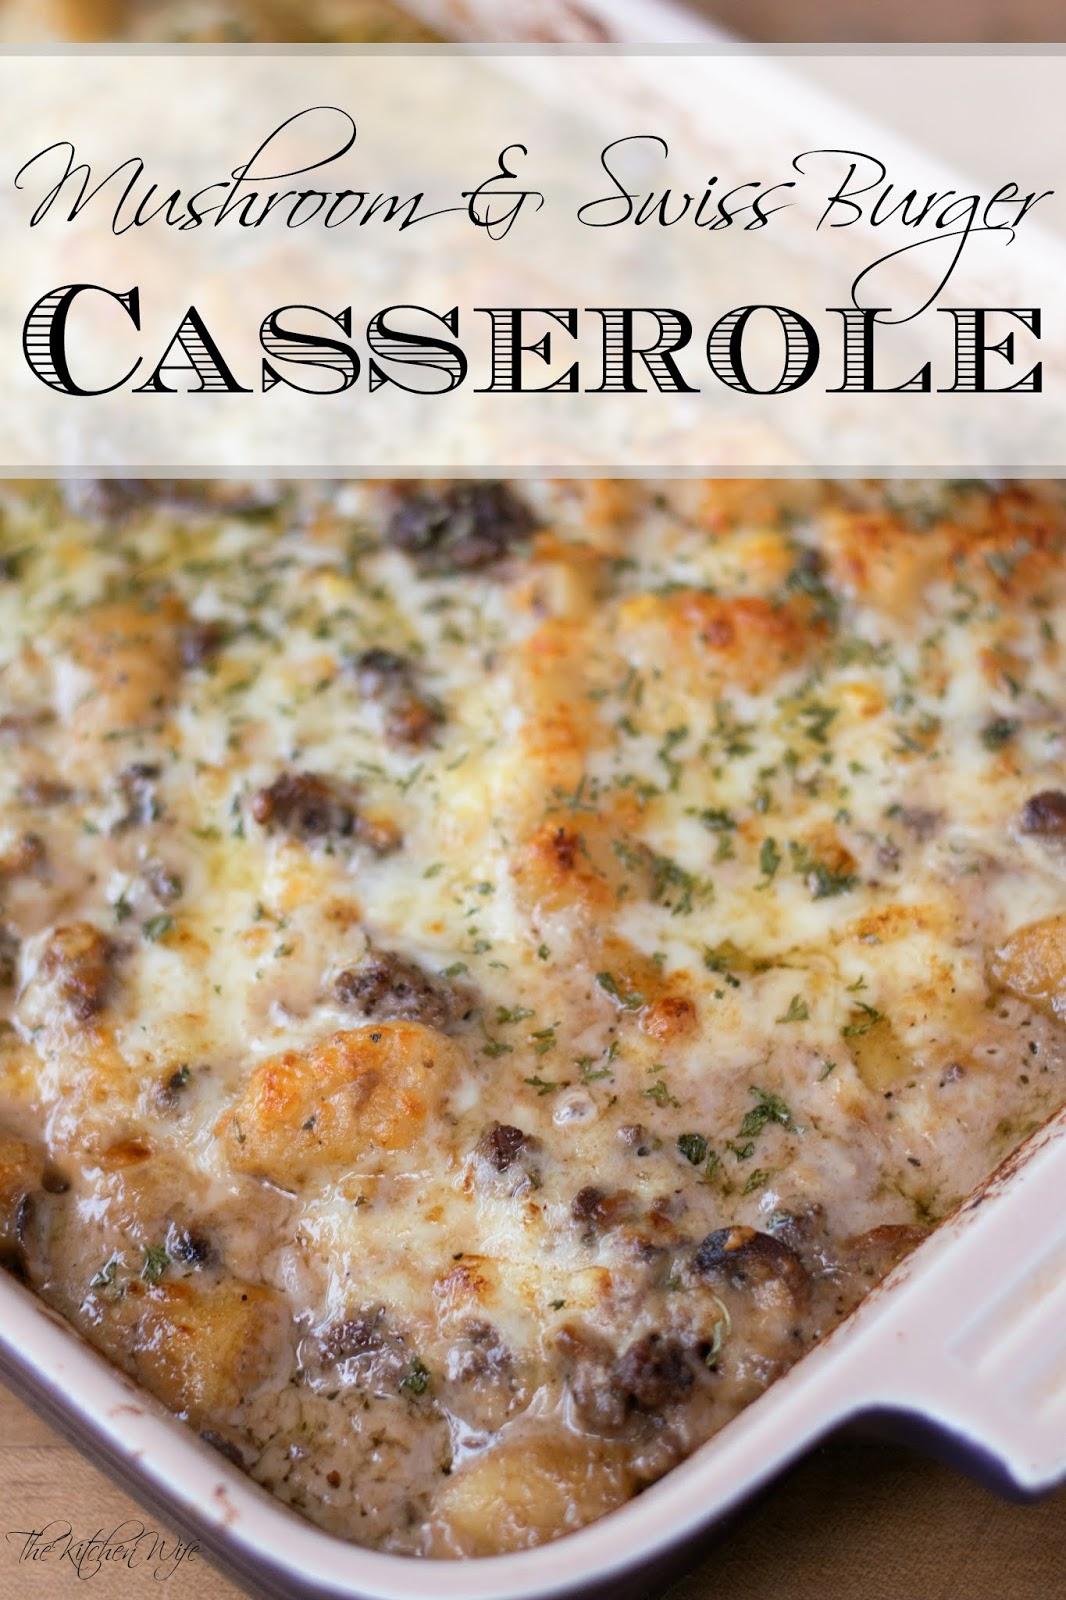 Mushroom And Swiss Burger Casserole Recipe The Kitchen Wife